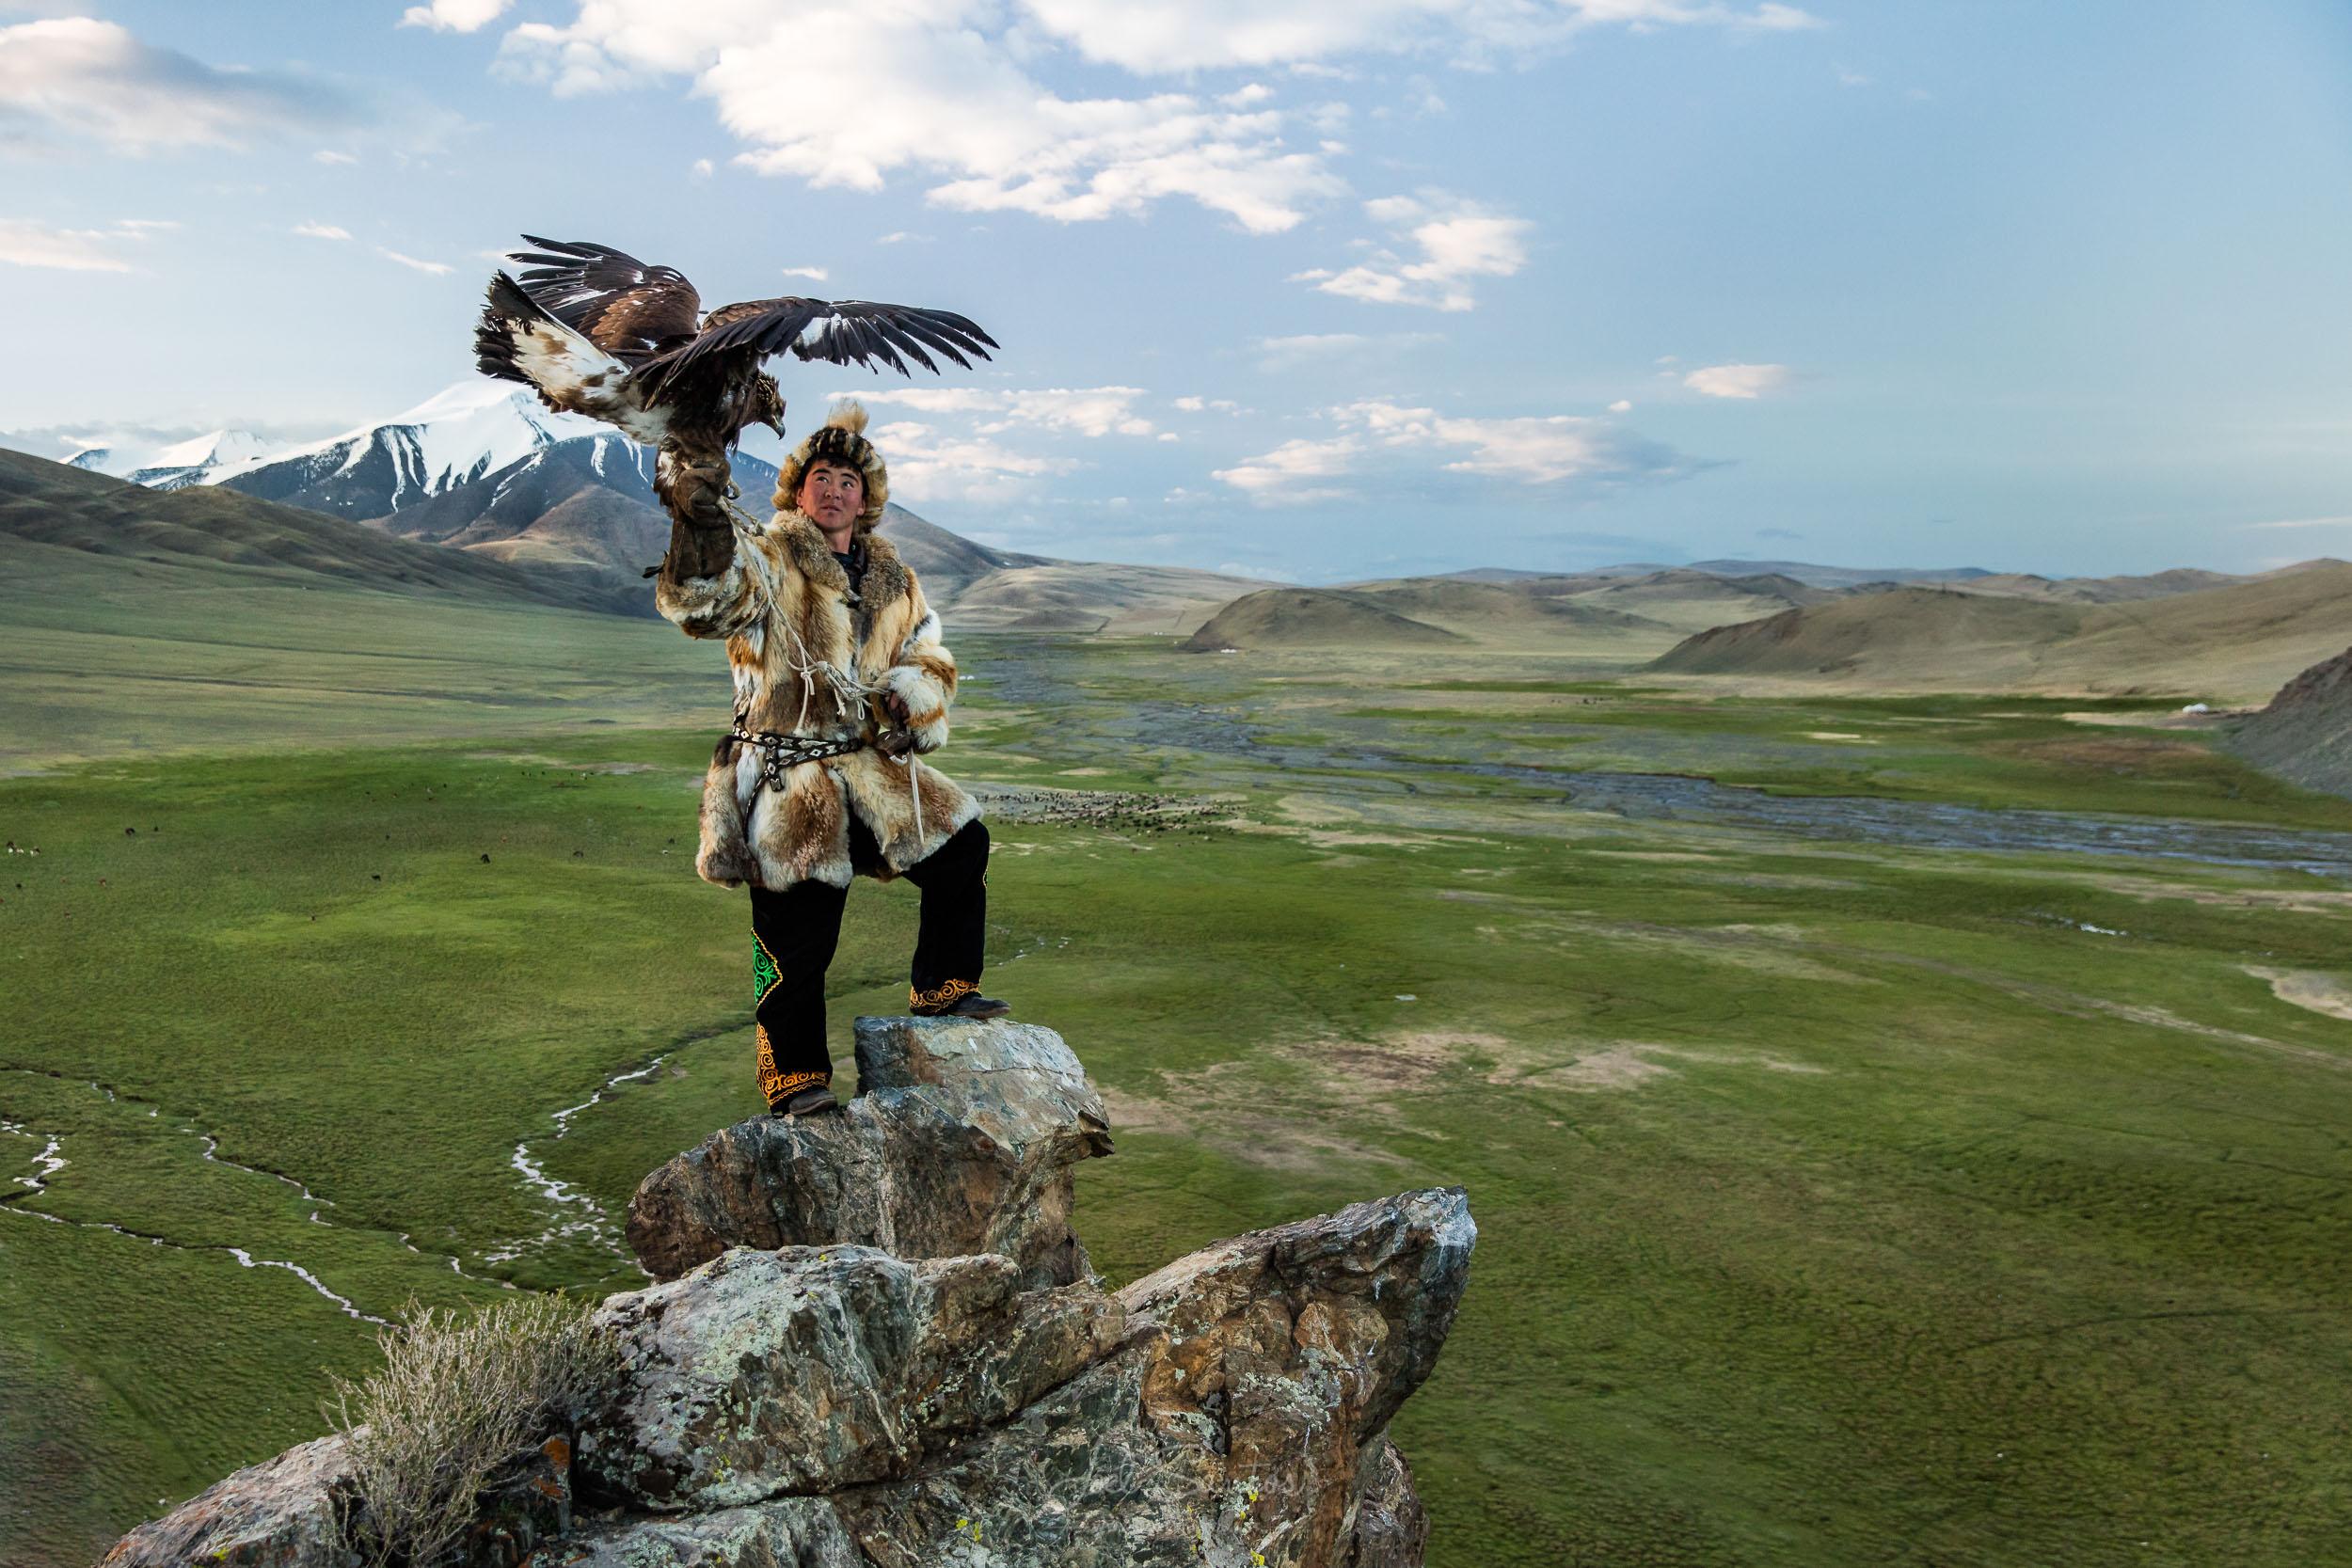 NOMAD HUNTERS - Eagle Hunters, the Tsaatan (Reindeer people) and KAZAKH Nomad MIGRATIONS